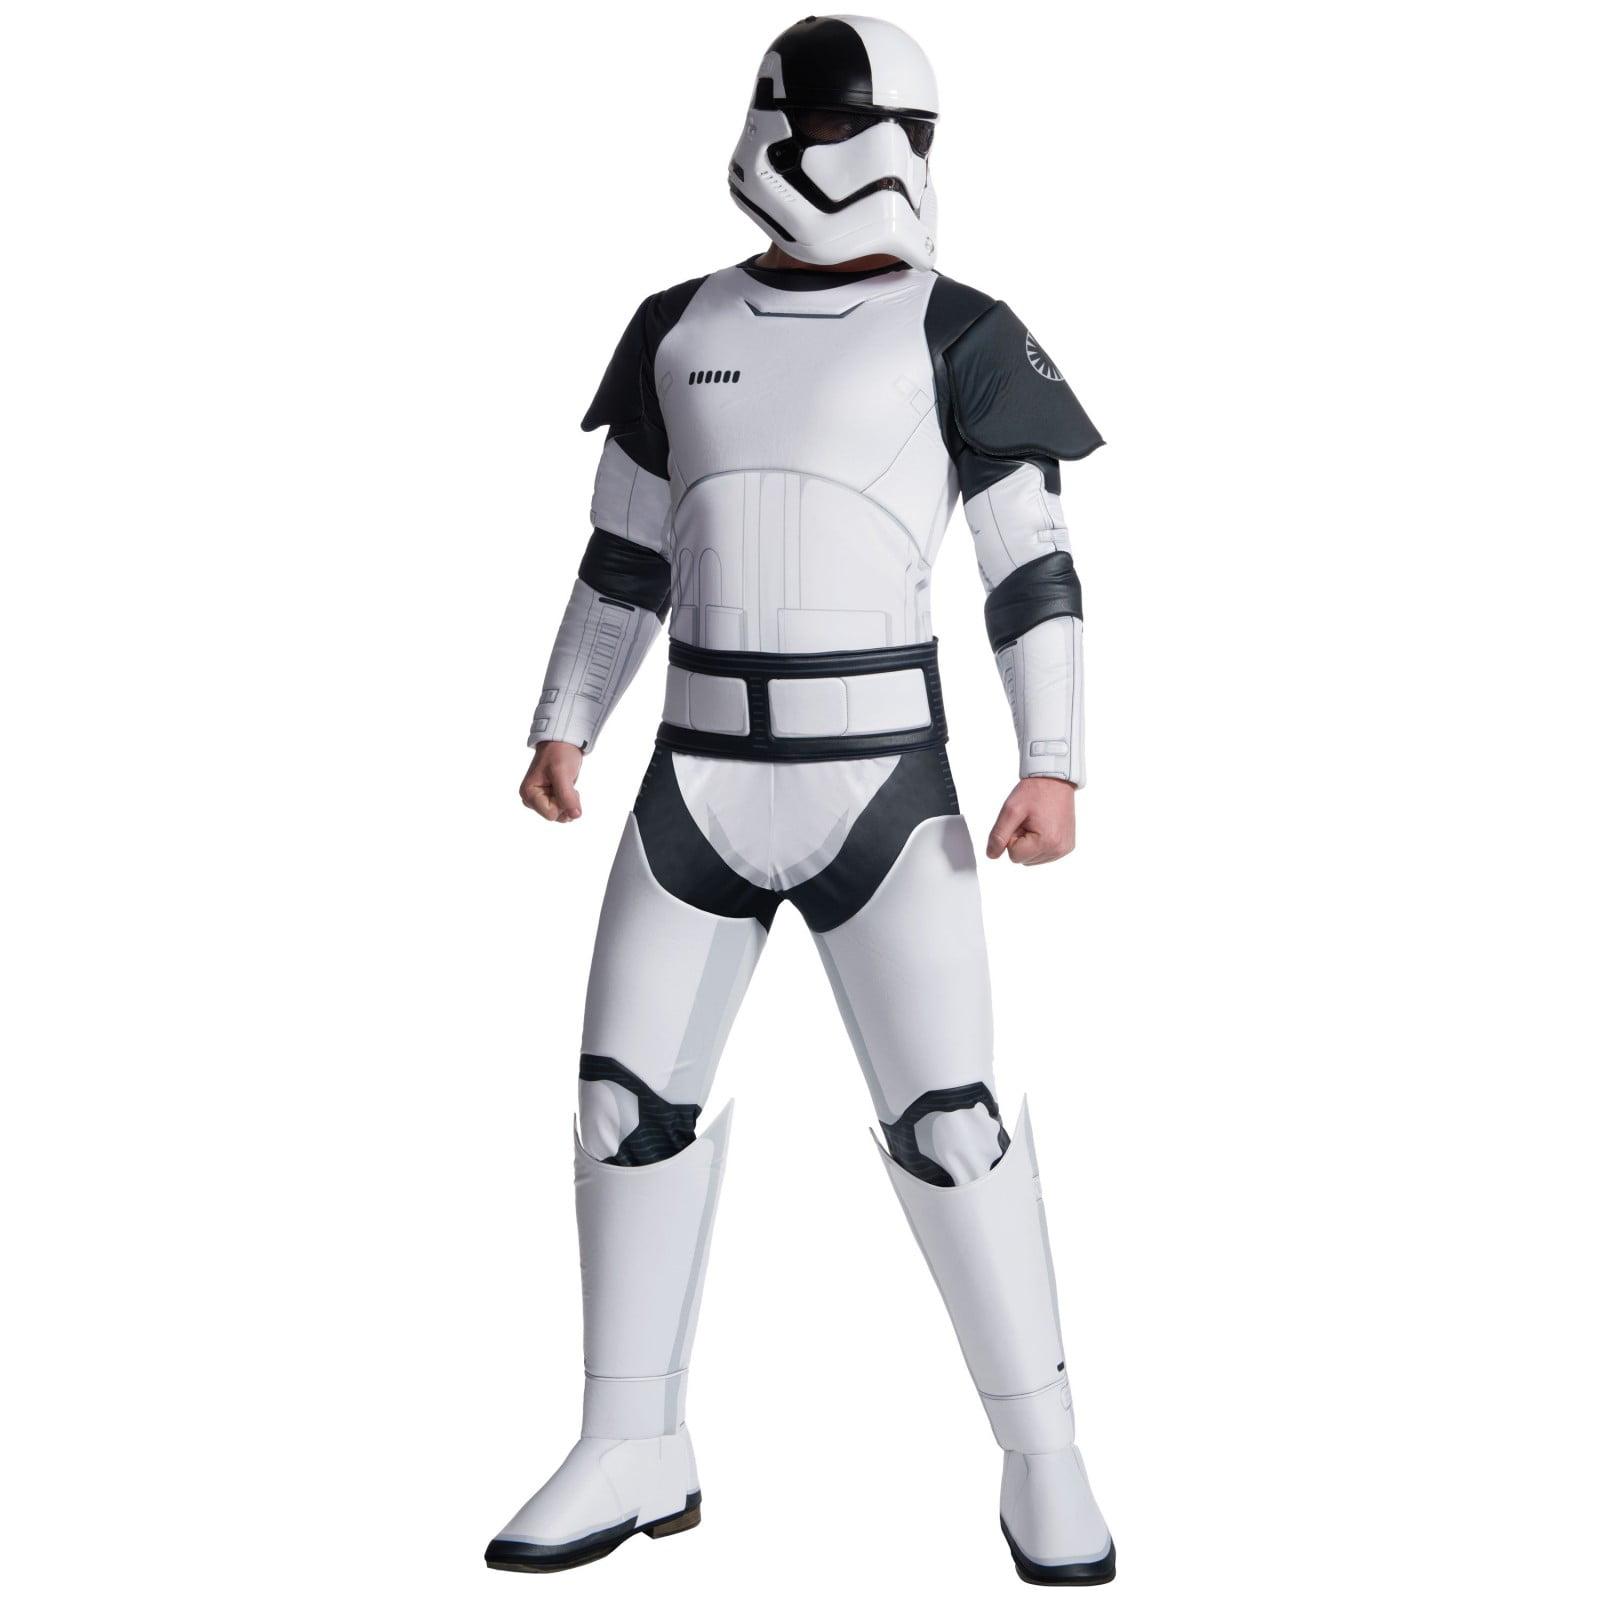 Star Wars Episode VIII - The Last Jedi Deluxe Adult Executioner Trooper Costume